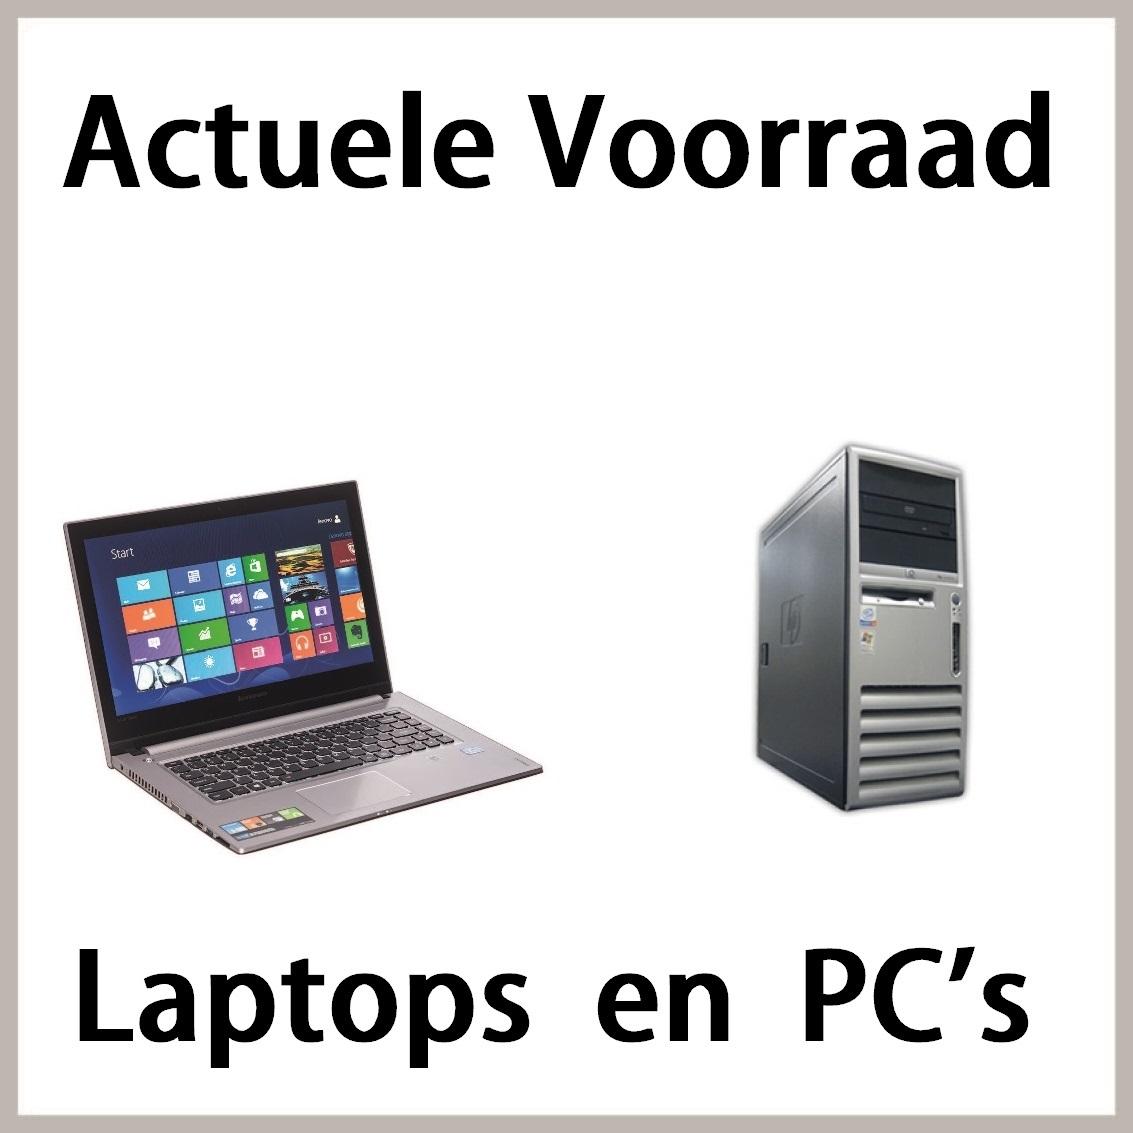 Computerwinkelnl